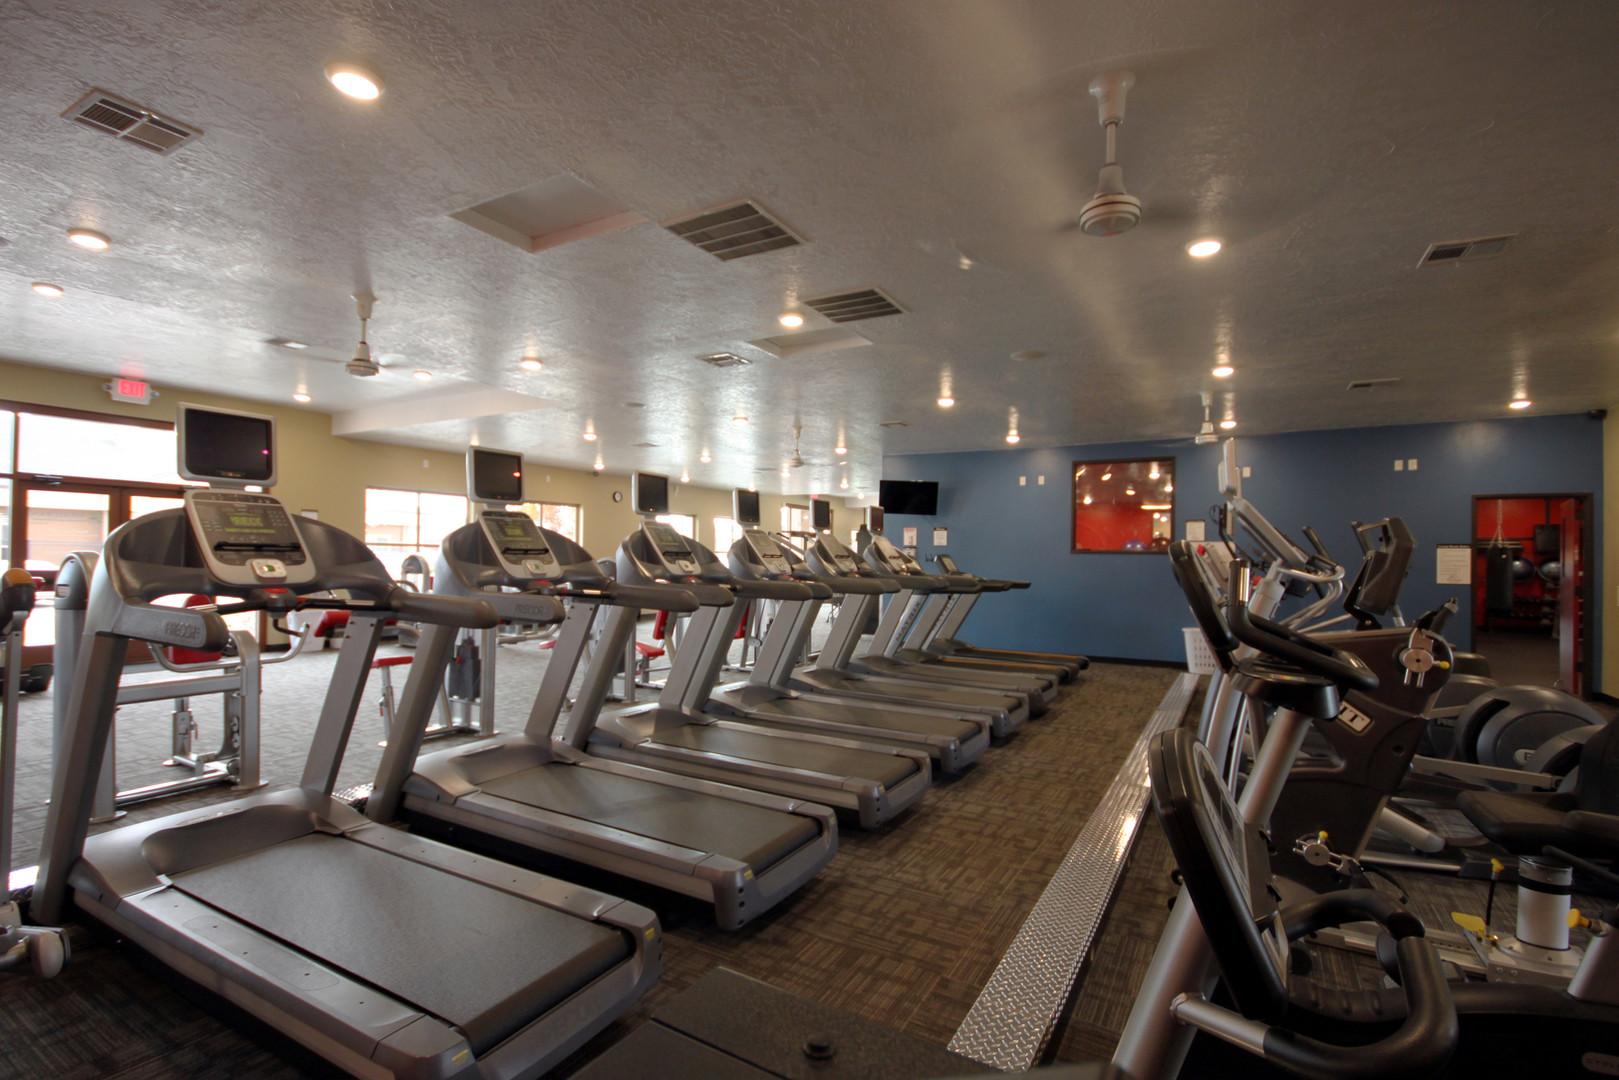 Everest - Treadmills.jpg